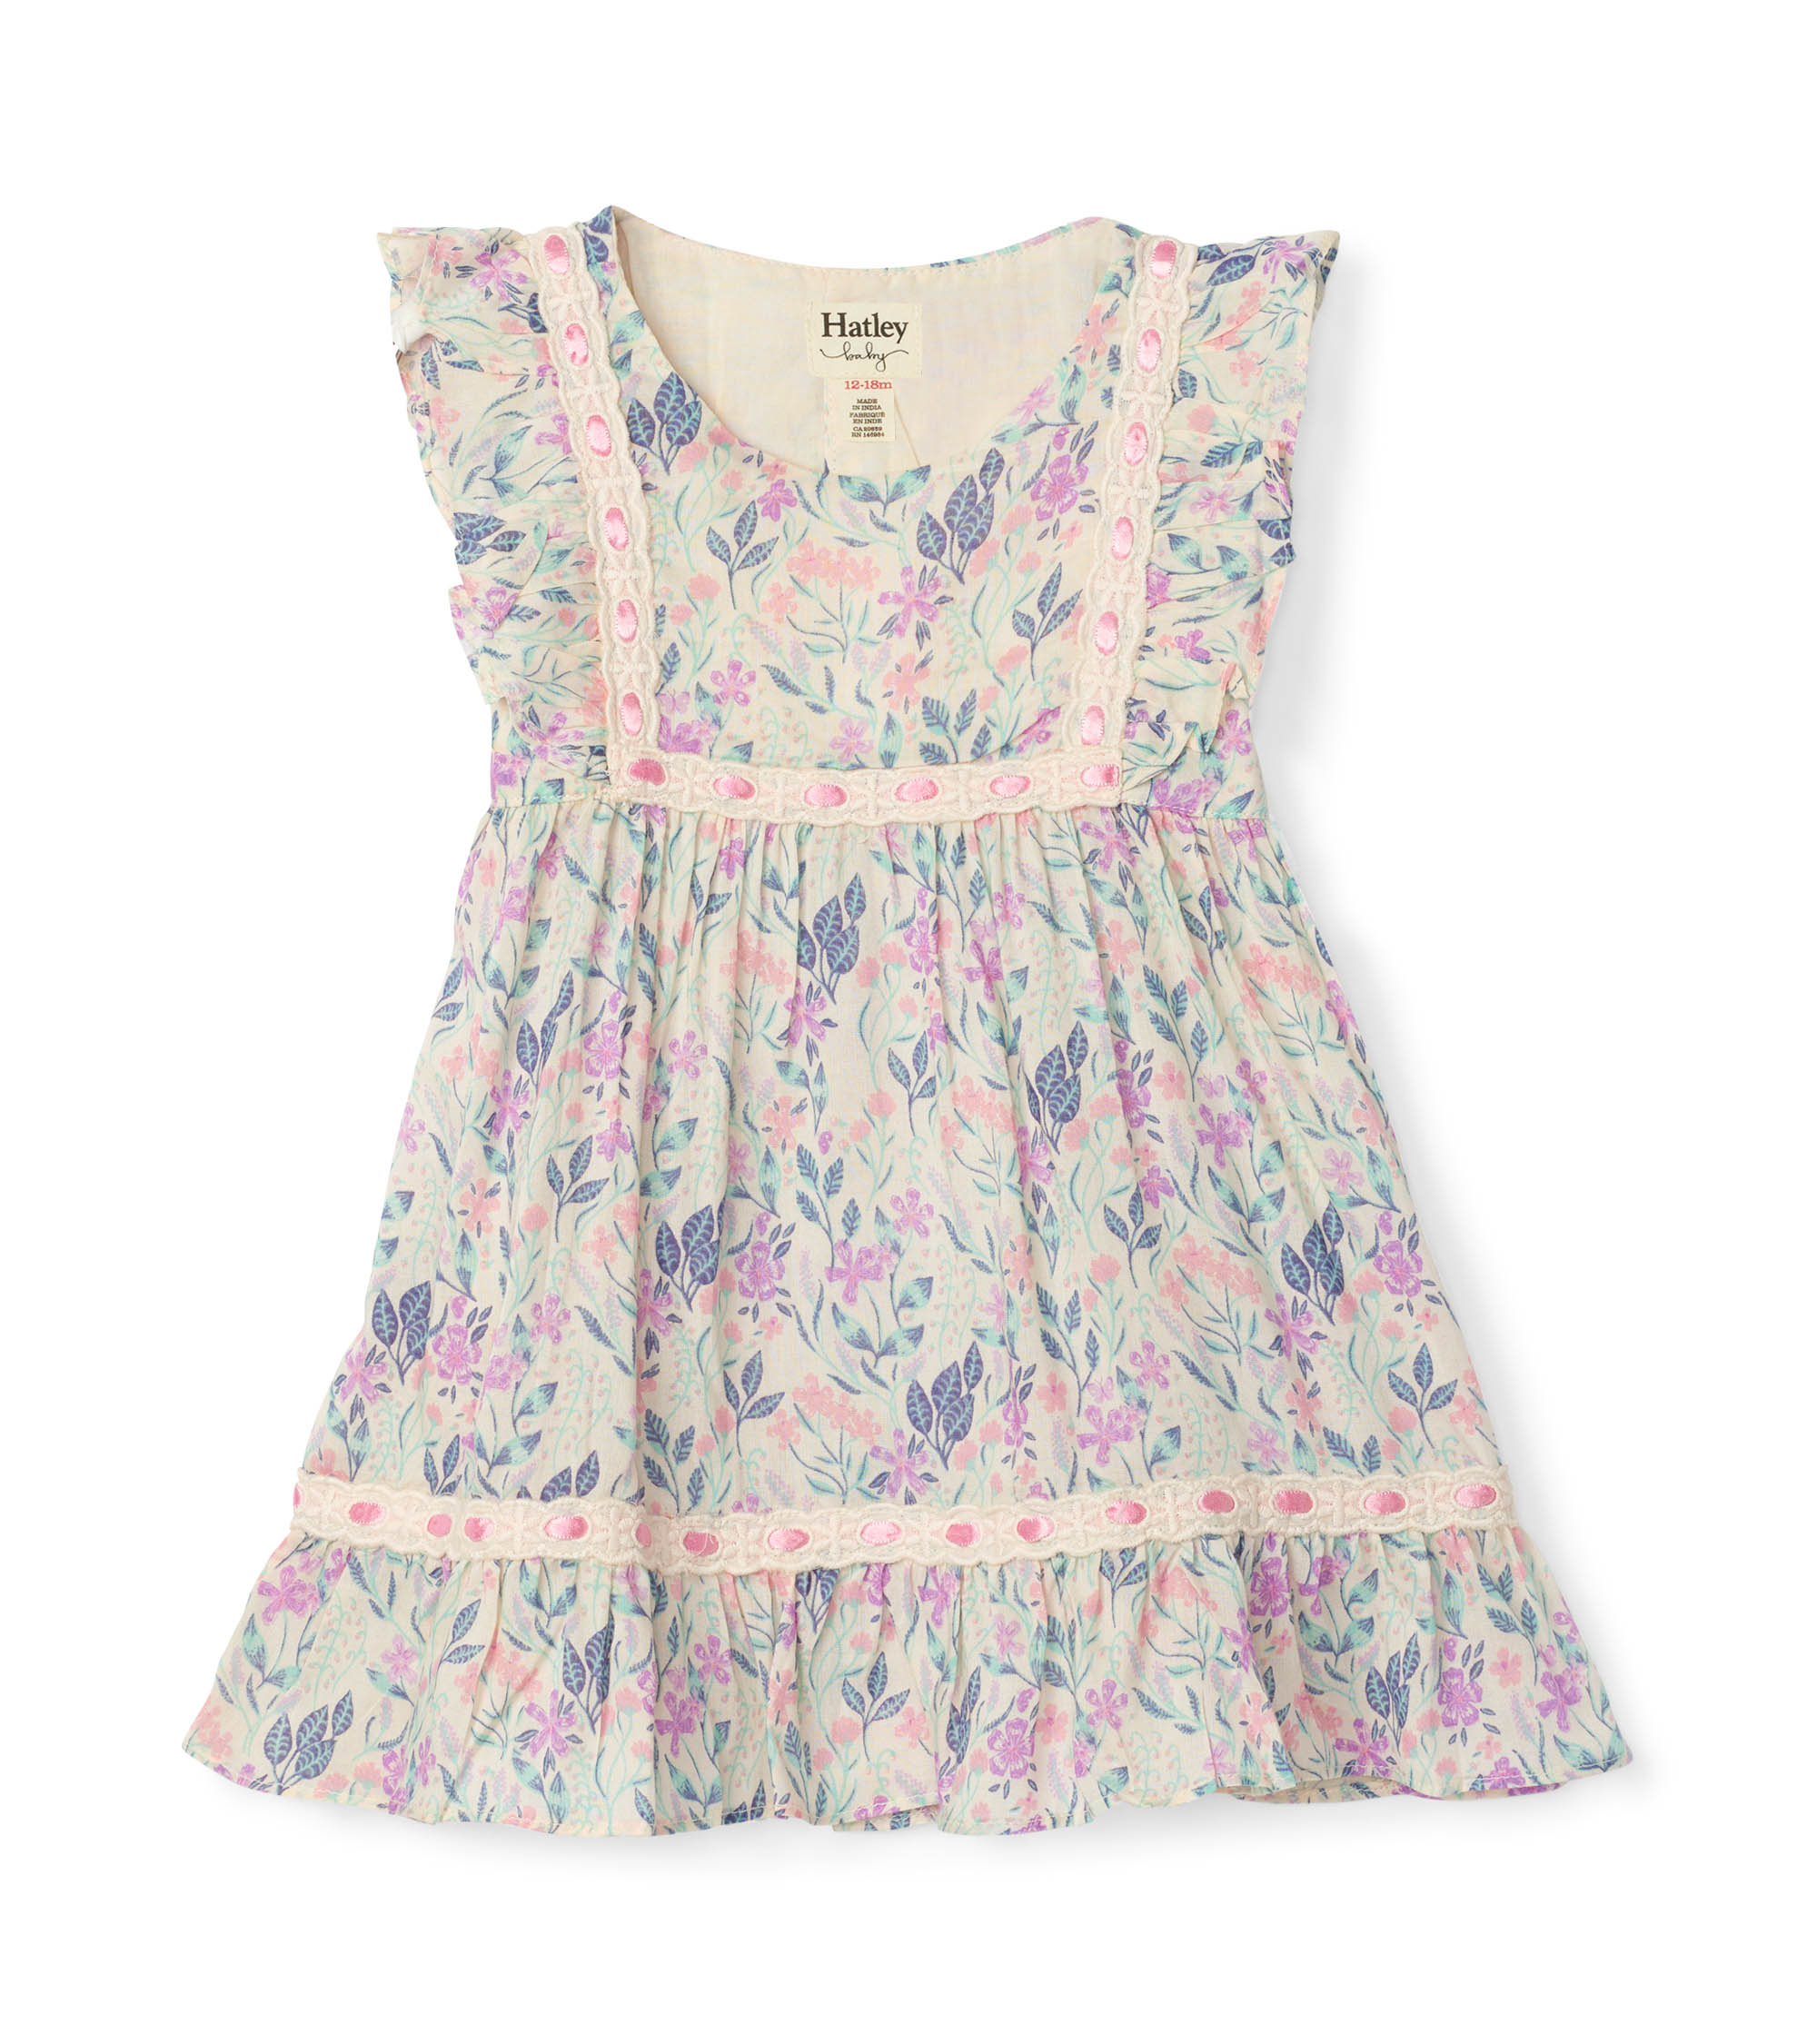 Hatley Baby Party Kleid - Flieder Blumen   Blue Flamingo ...